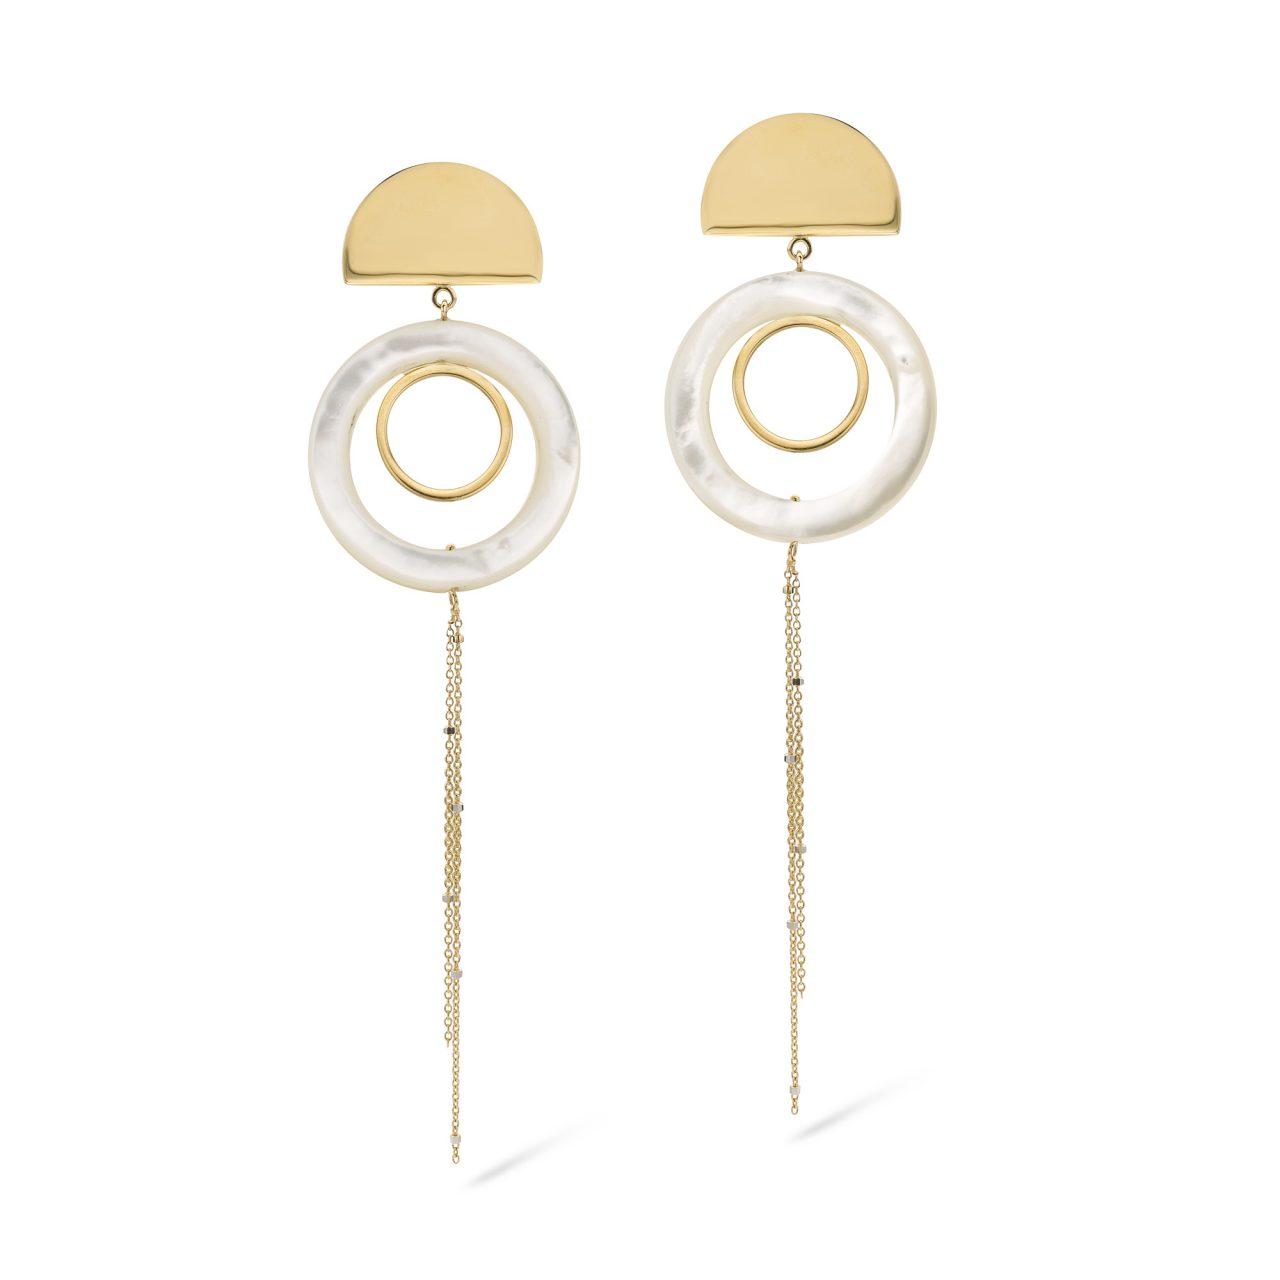 Oorbellen Arielle parelmoer piece unique statement earrings fine jewelry parel gent